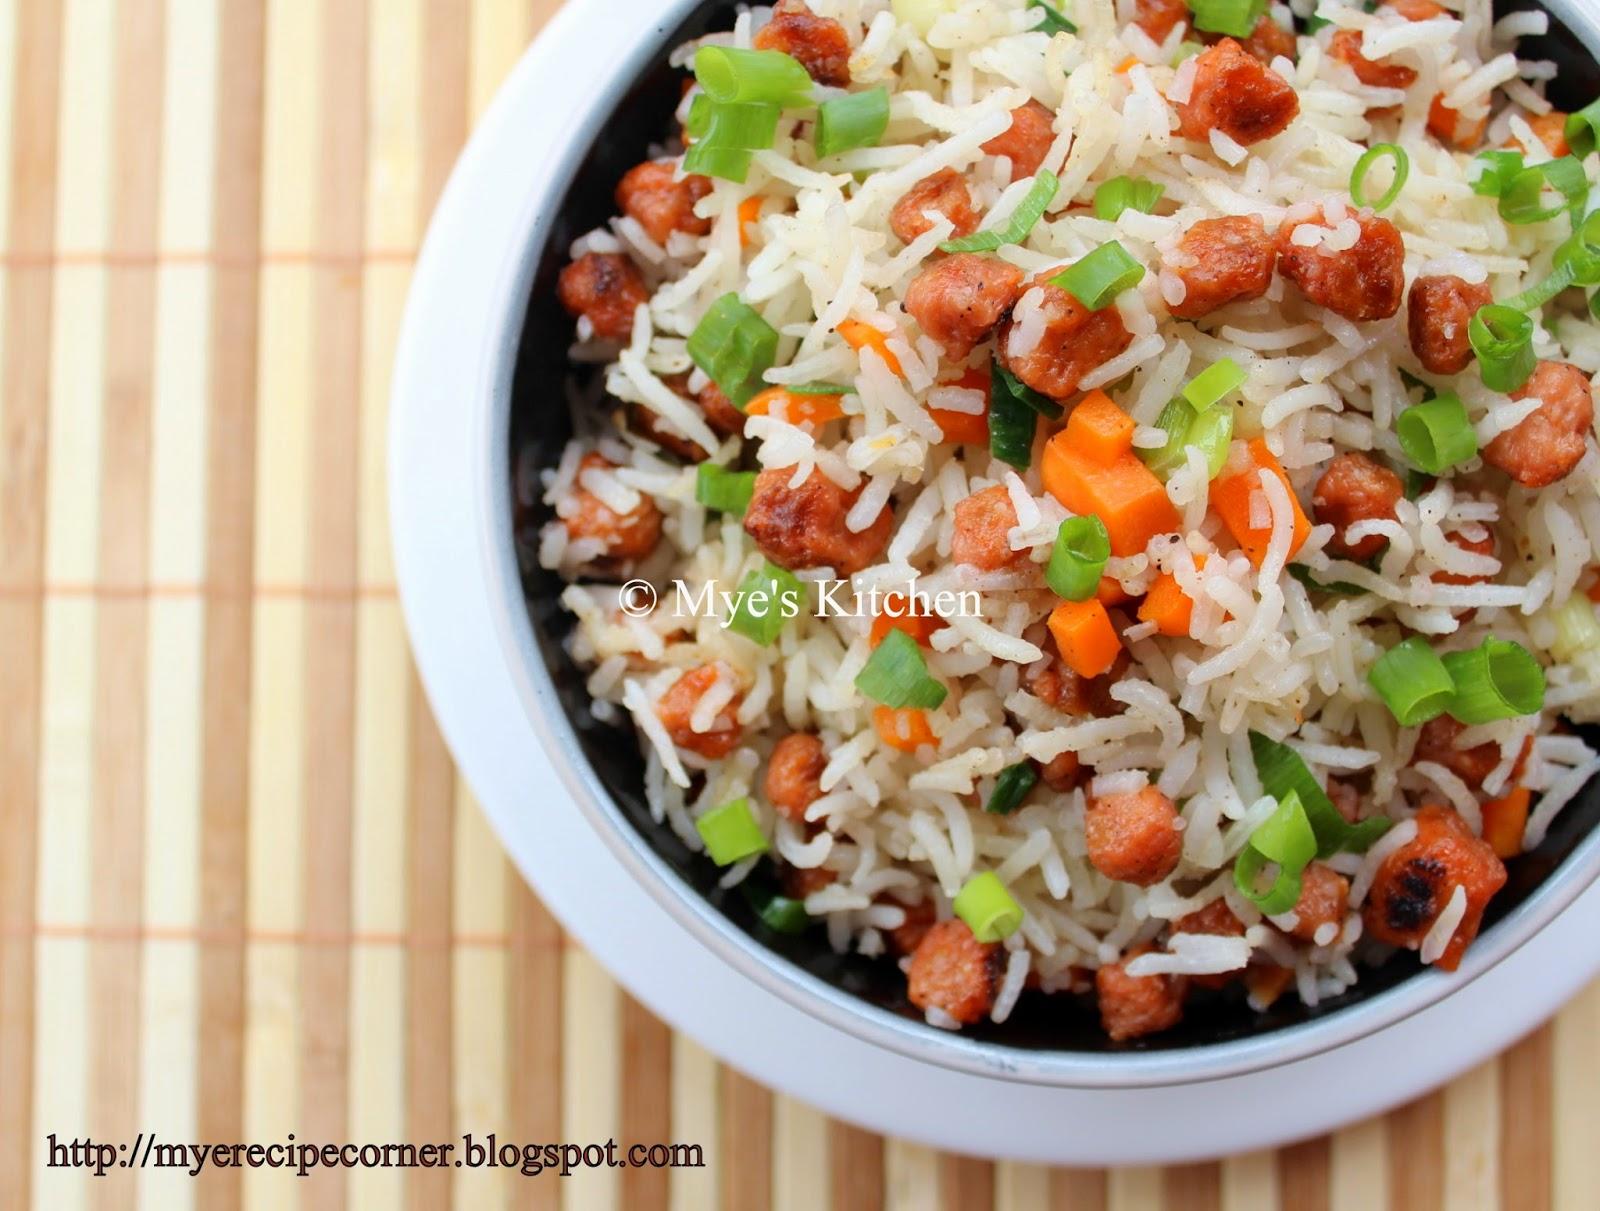 Myes kitchen soya chunks fried rice meal maker recipes soya chunks fried rice forumfinder Choice Image